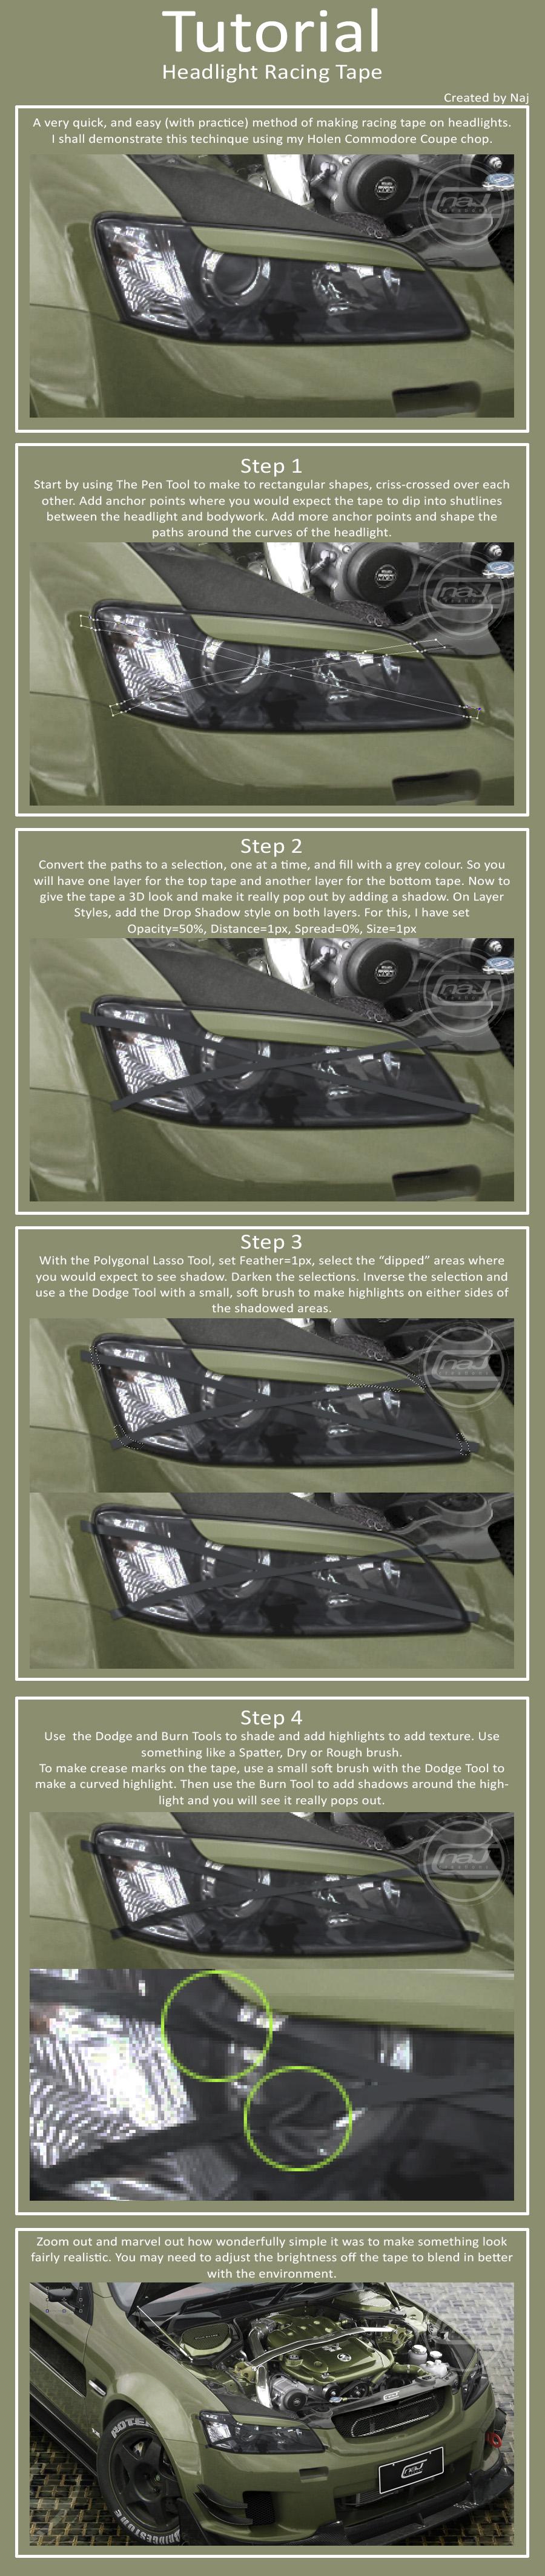 Racing Headlight Tape Tutorial